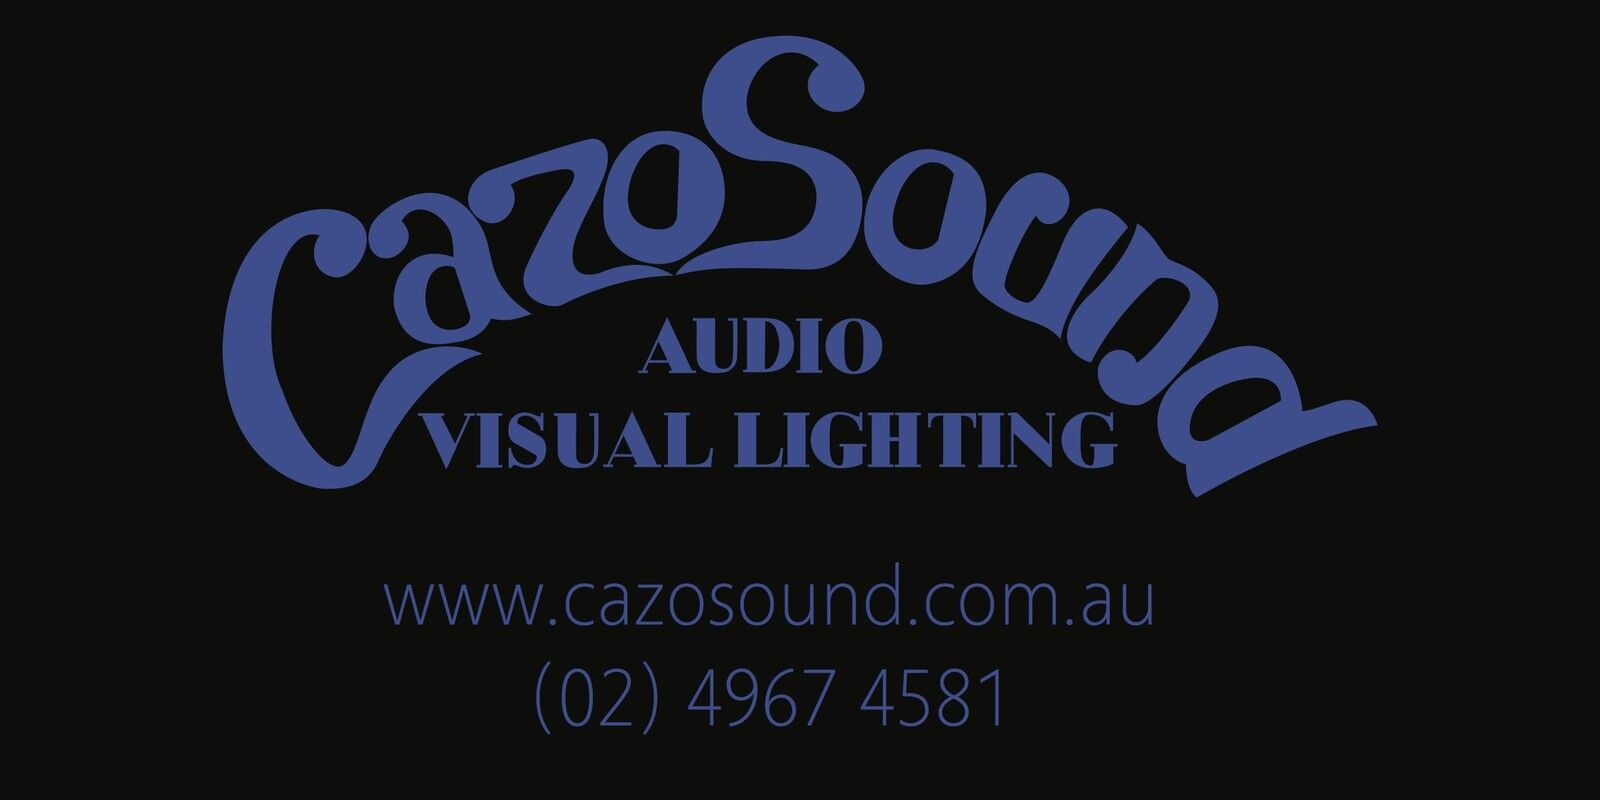 CazoSound